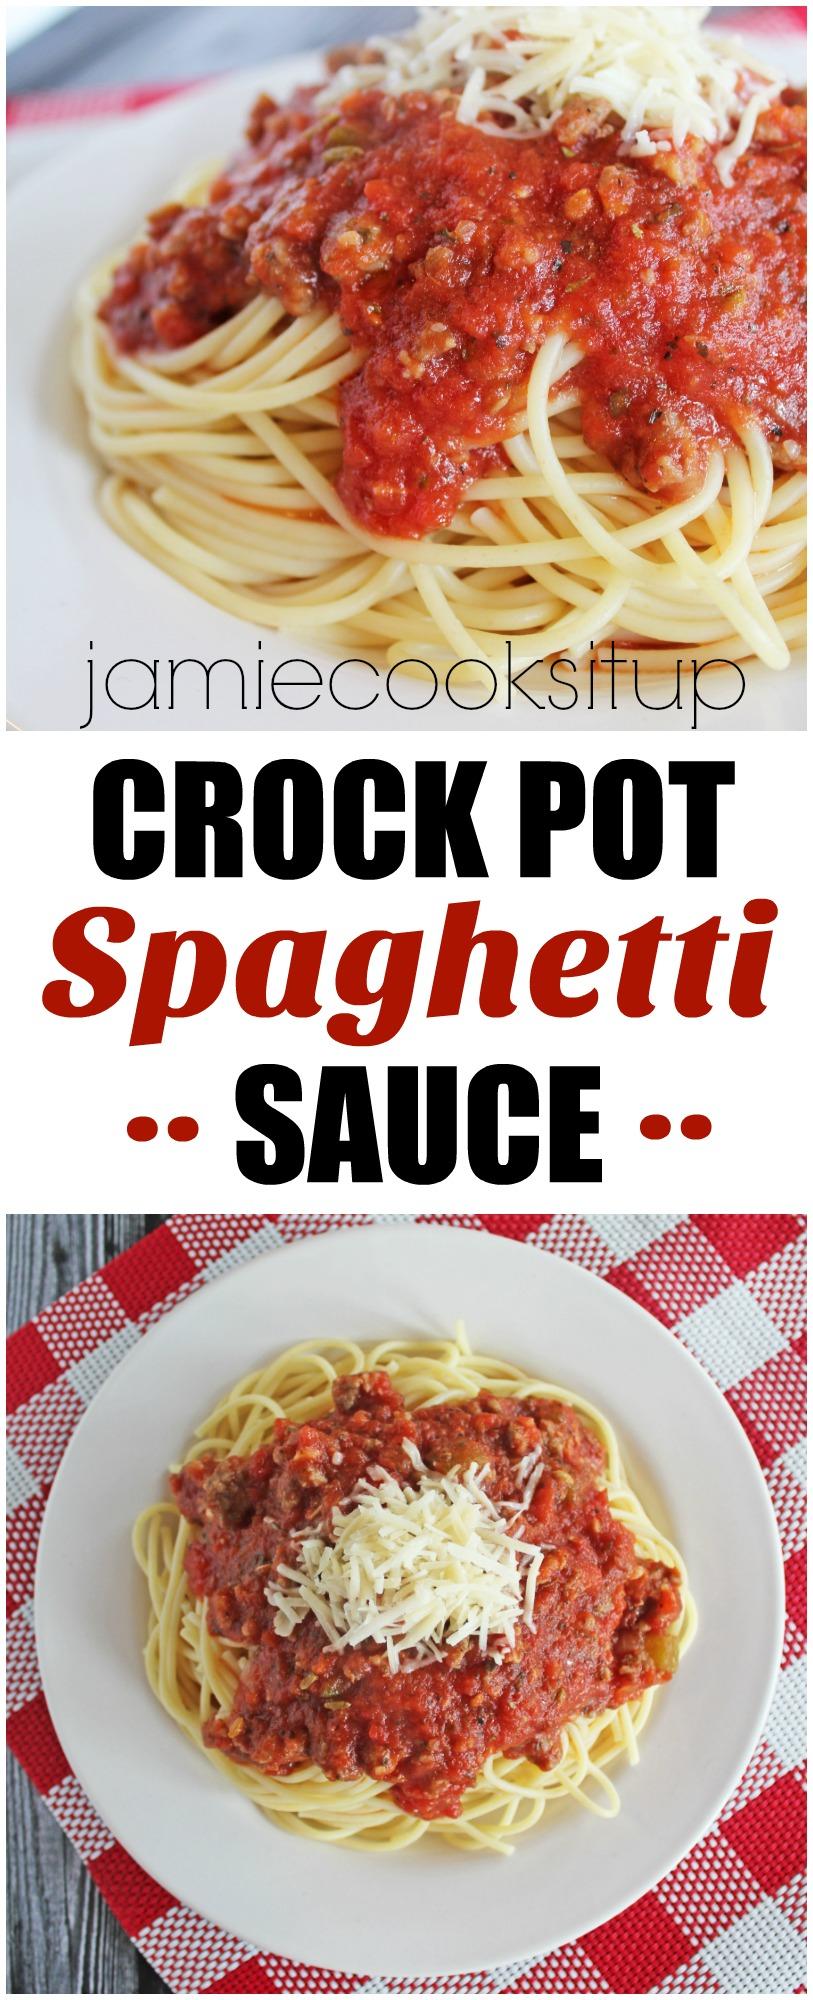 crock-pot-spaghetti-sauce-at-jamie-cooks-it-up